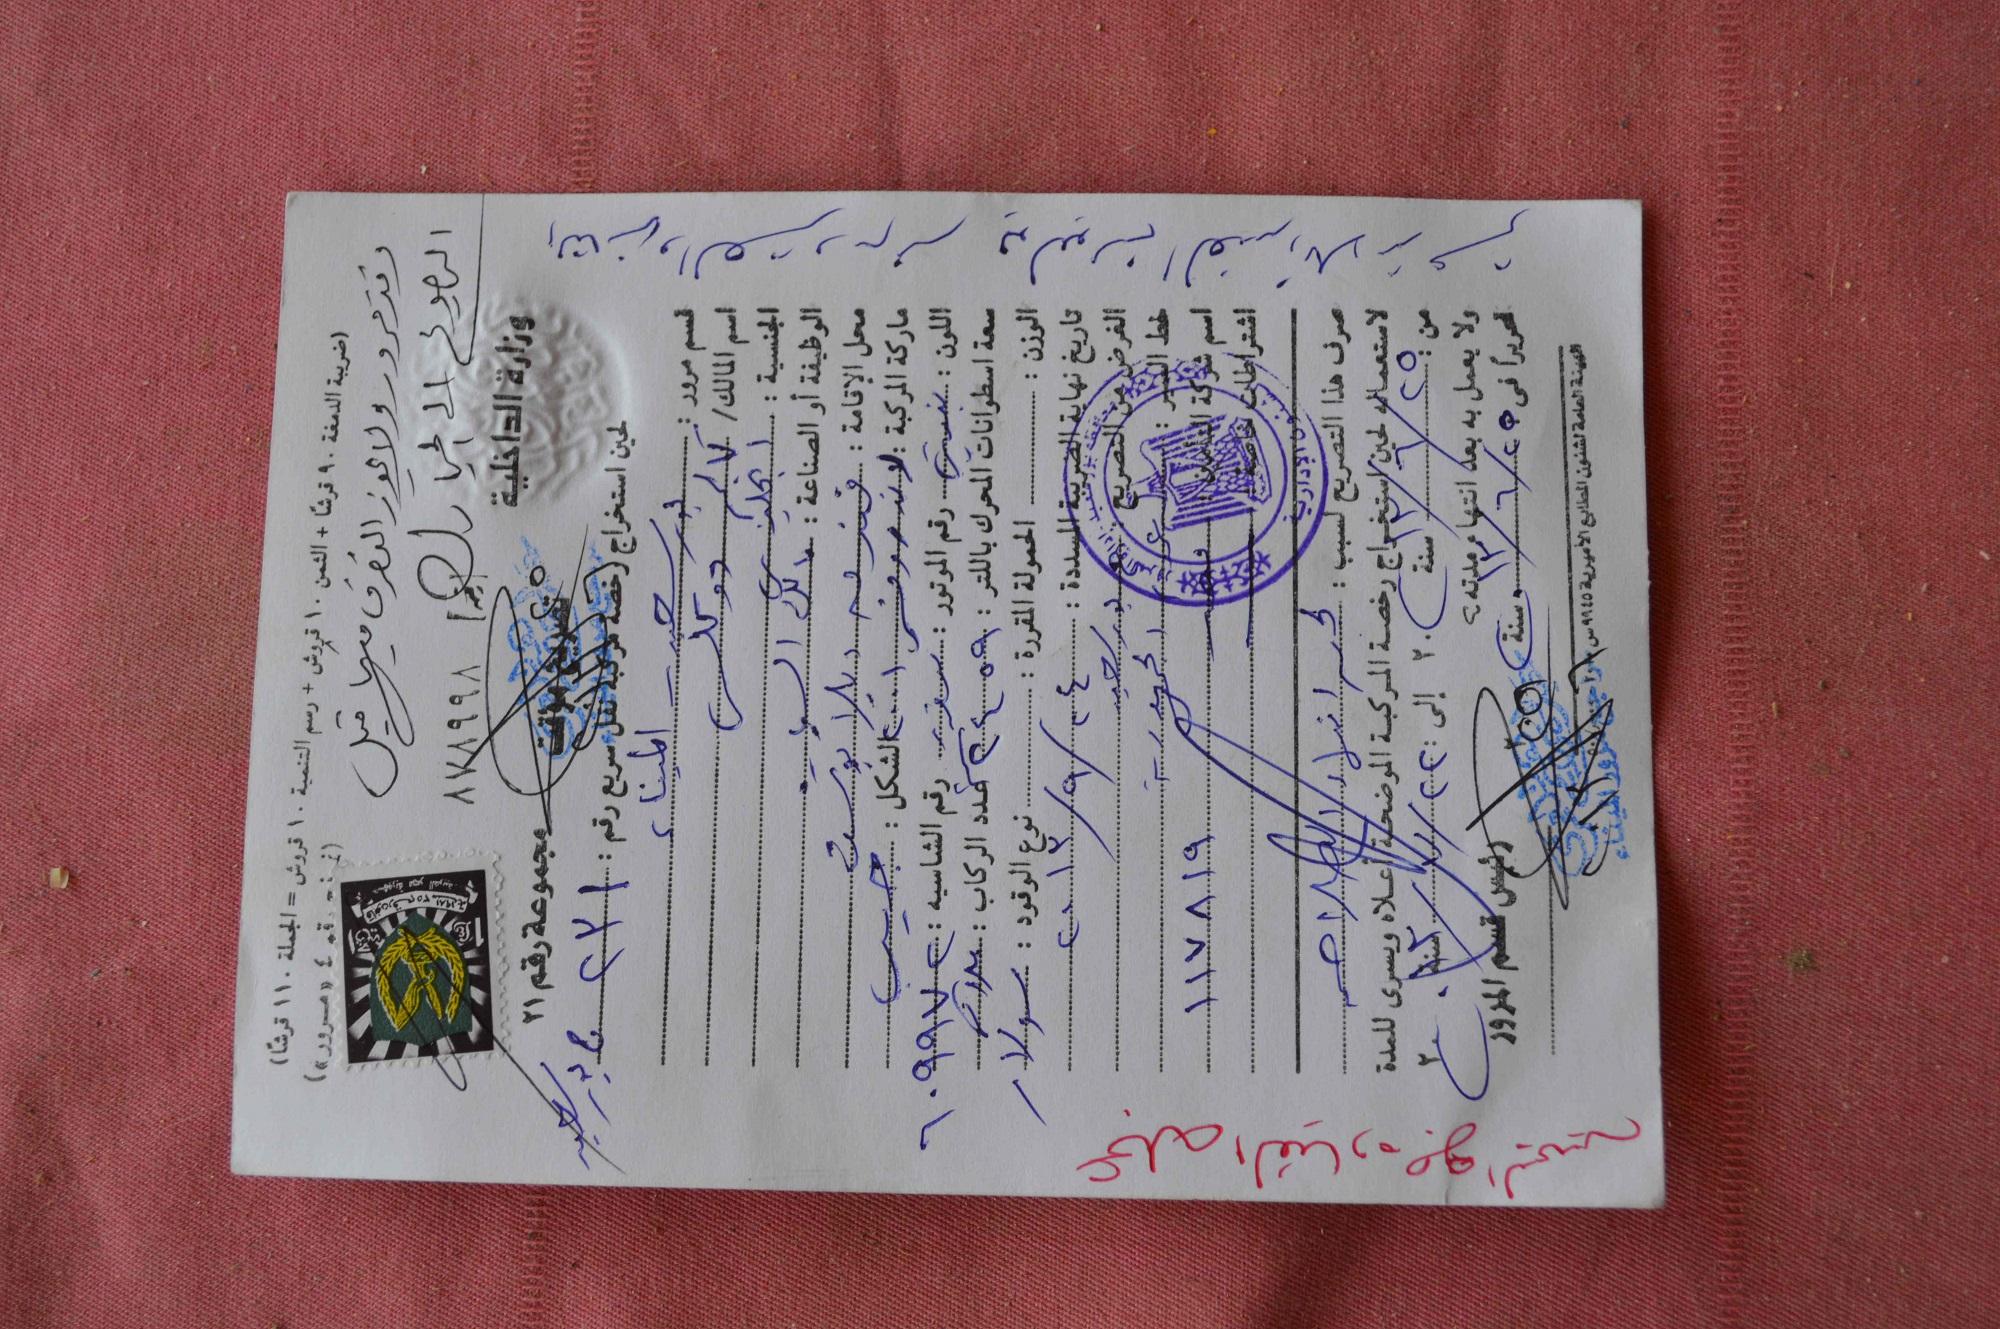 2014-CMCPHERSON-SUDAN-04